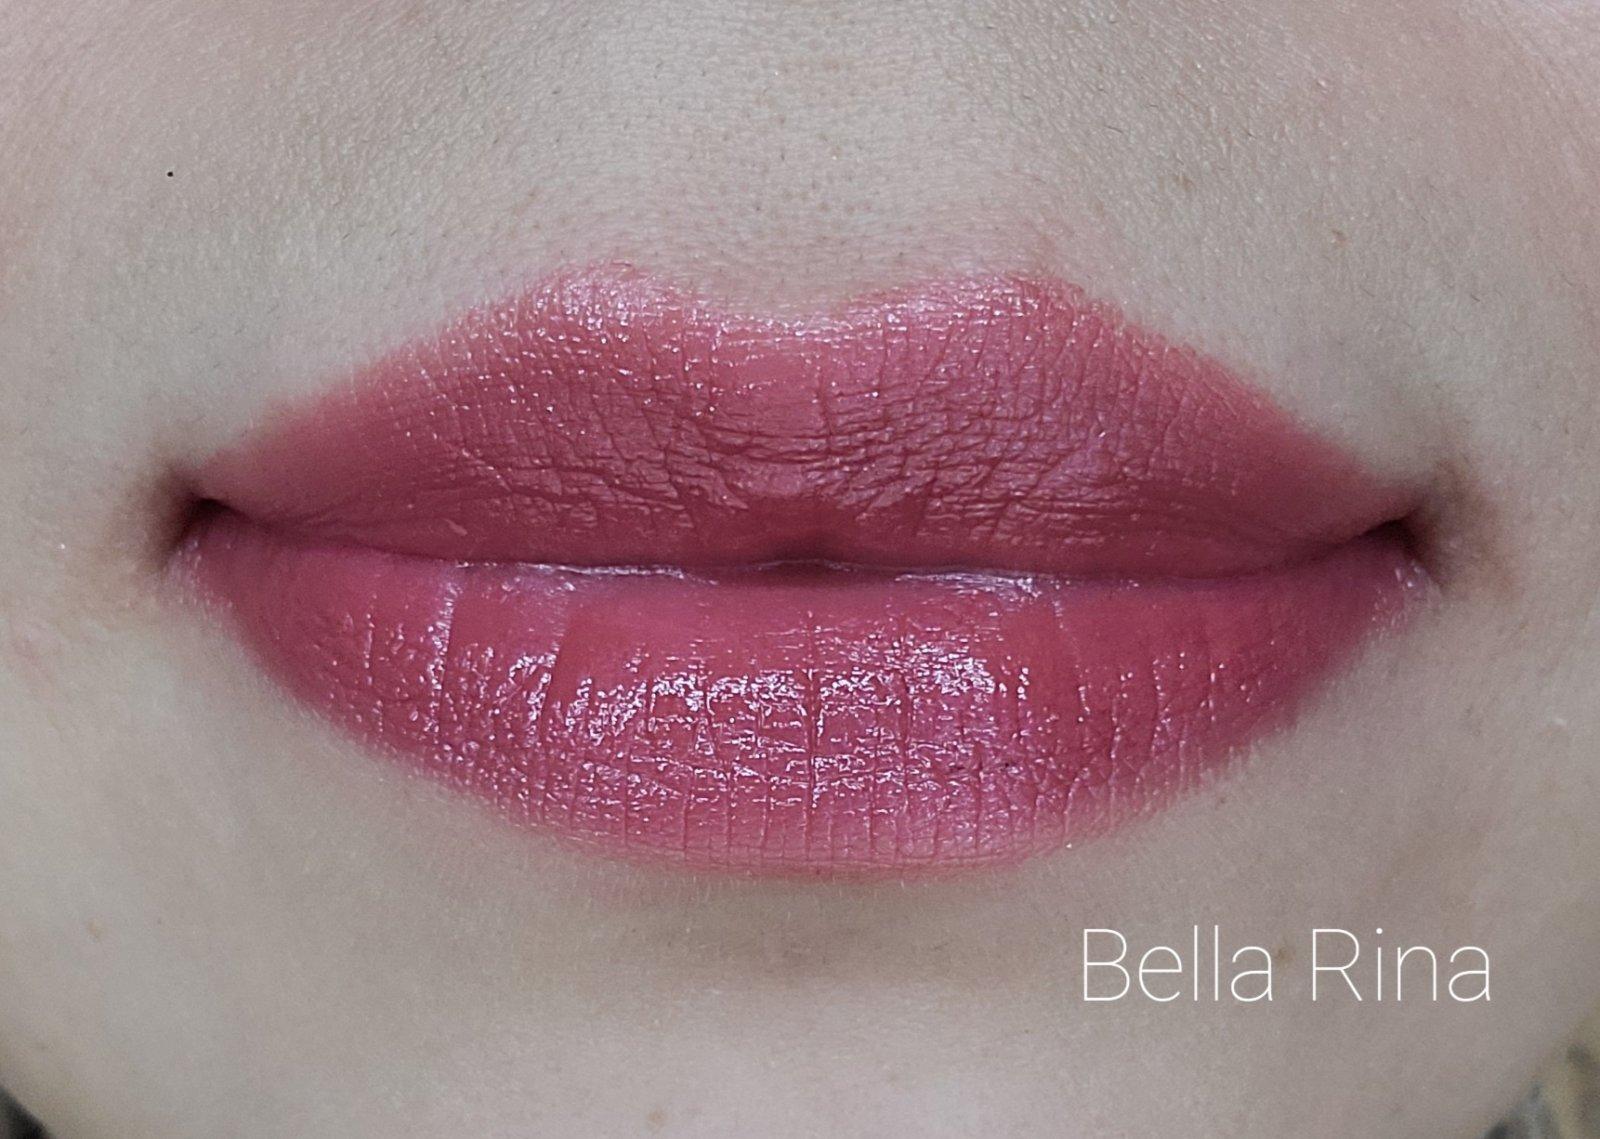 Image of close up lips wearing the shade called Bella Rina. A warm medium pink.